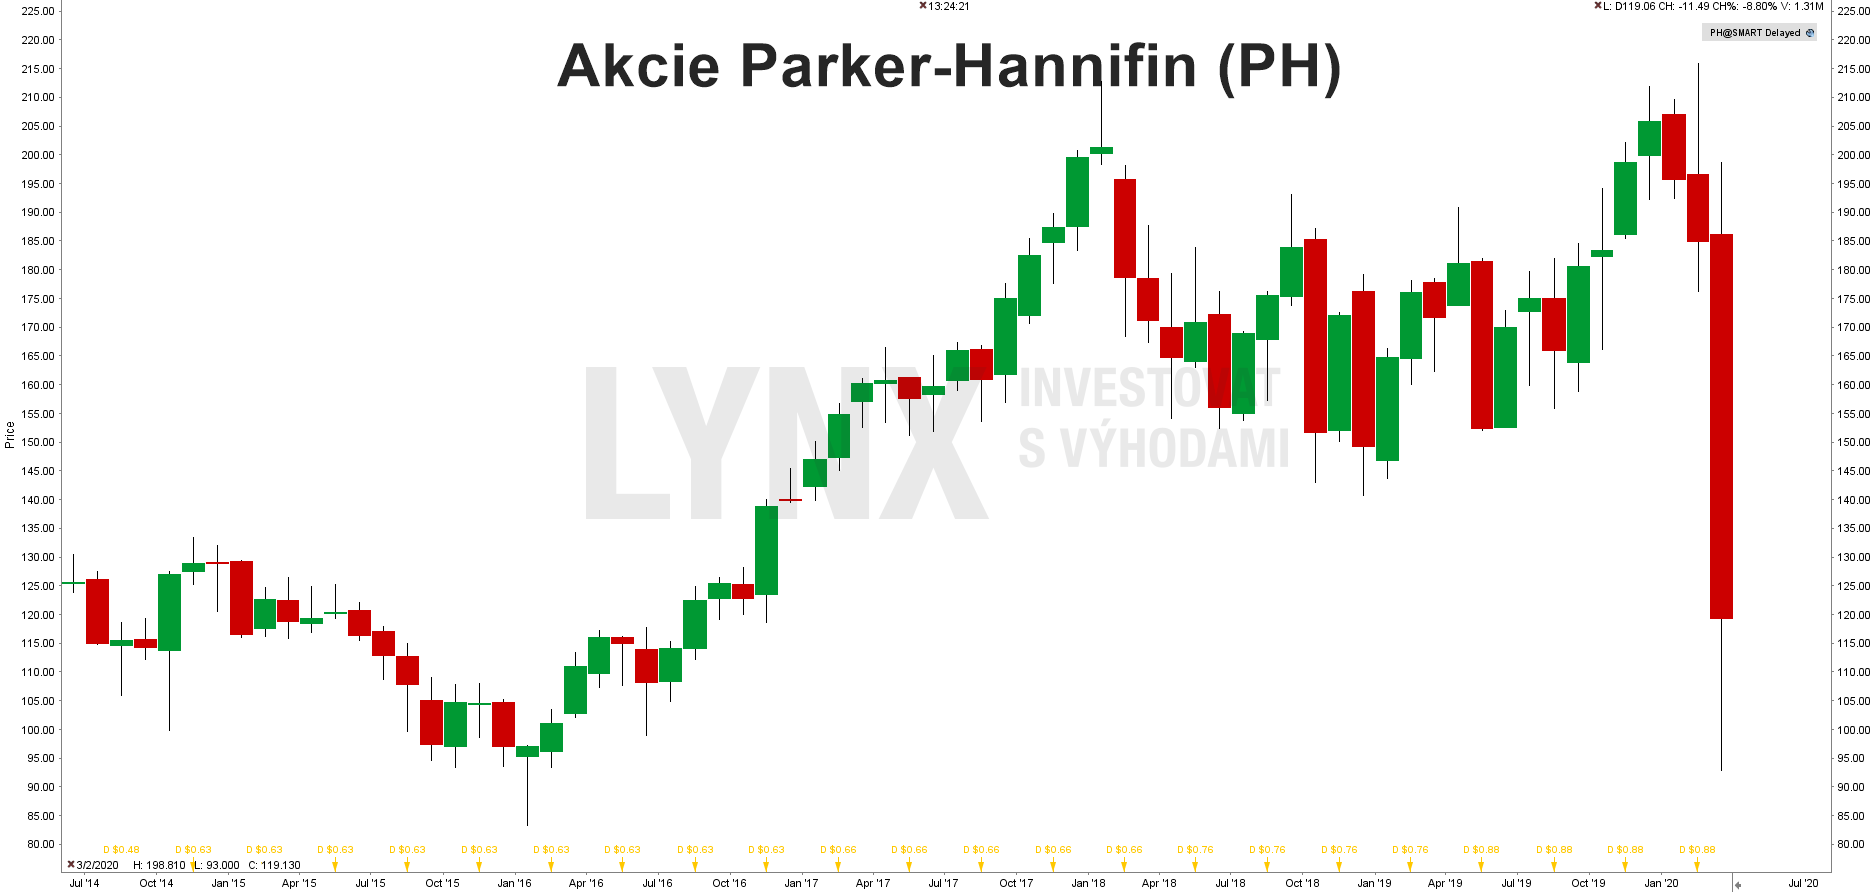 Akcie Parker-Hannifin (PH)